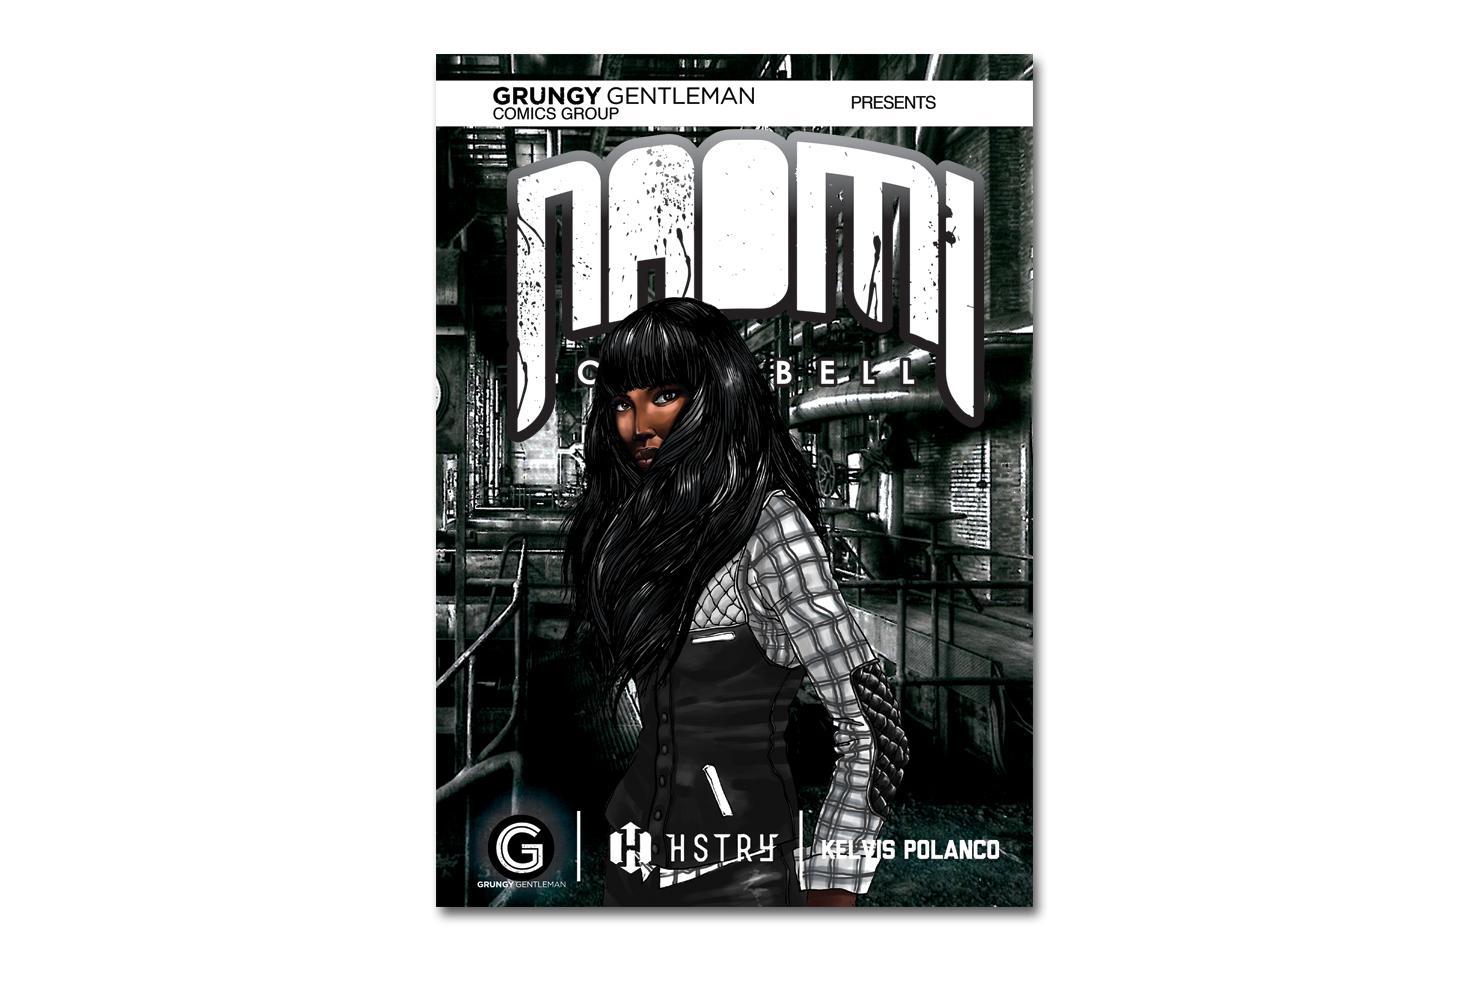 HSTRY x Grungy Gentleman x Kelvis Polanco Comic Book Covers